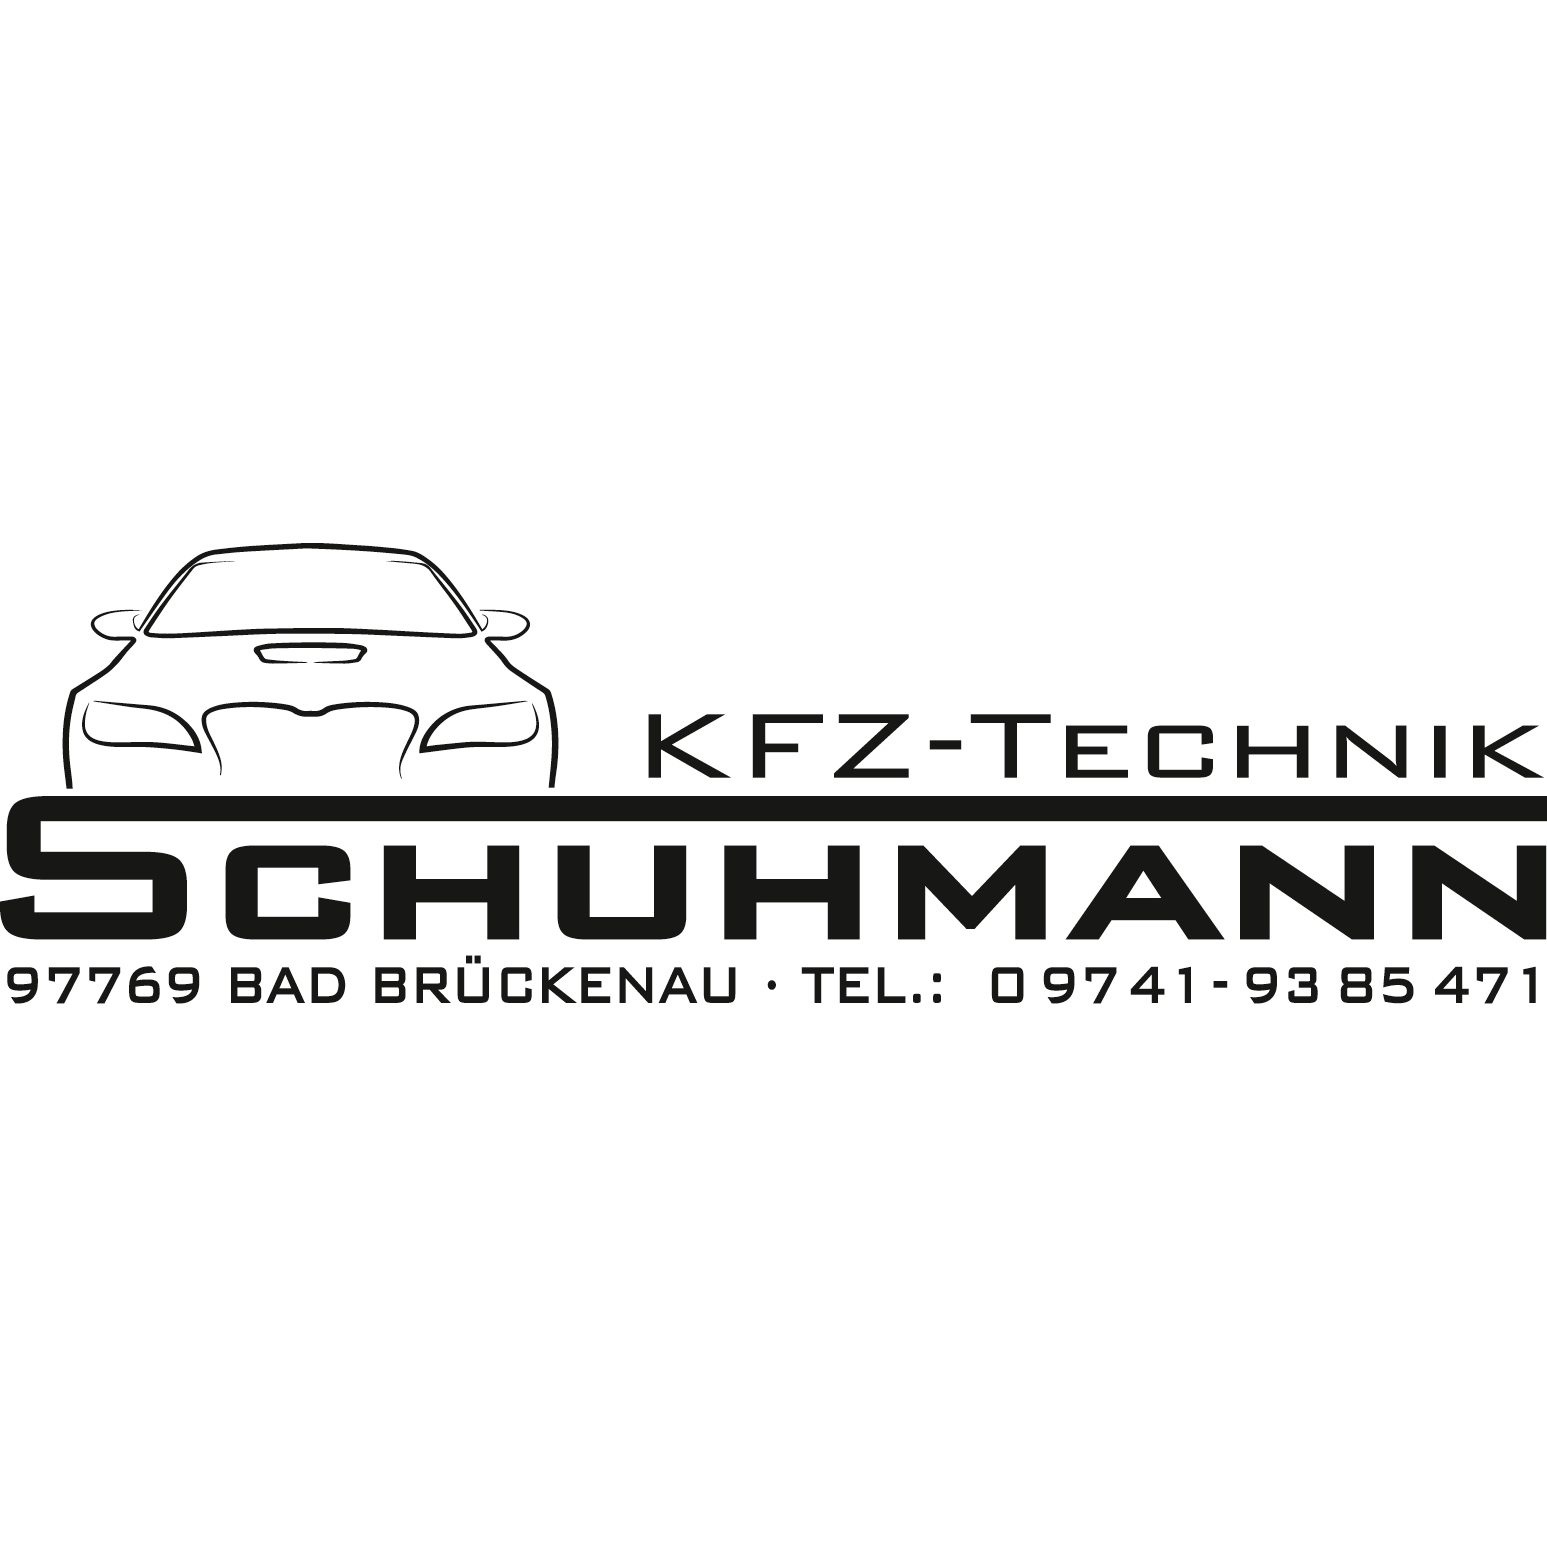 KFZ Technik Schuhmann